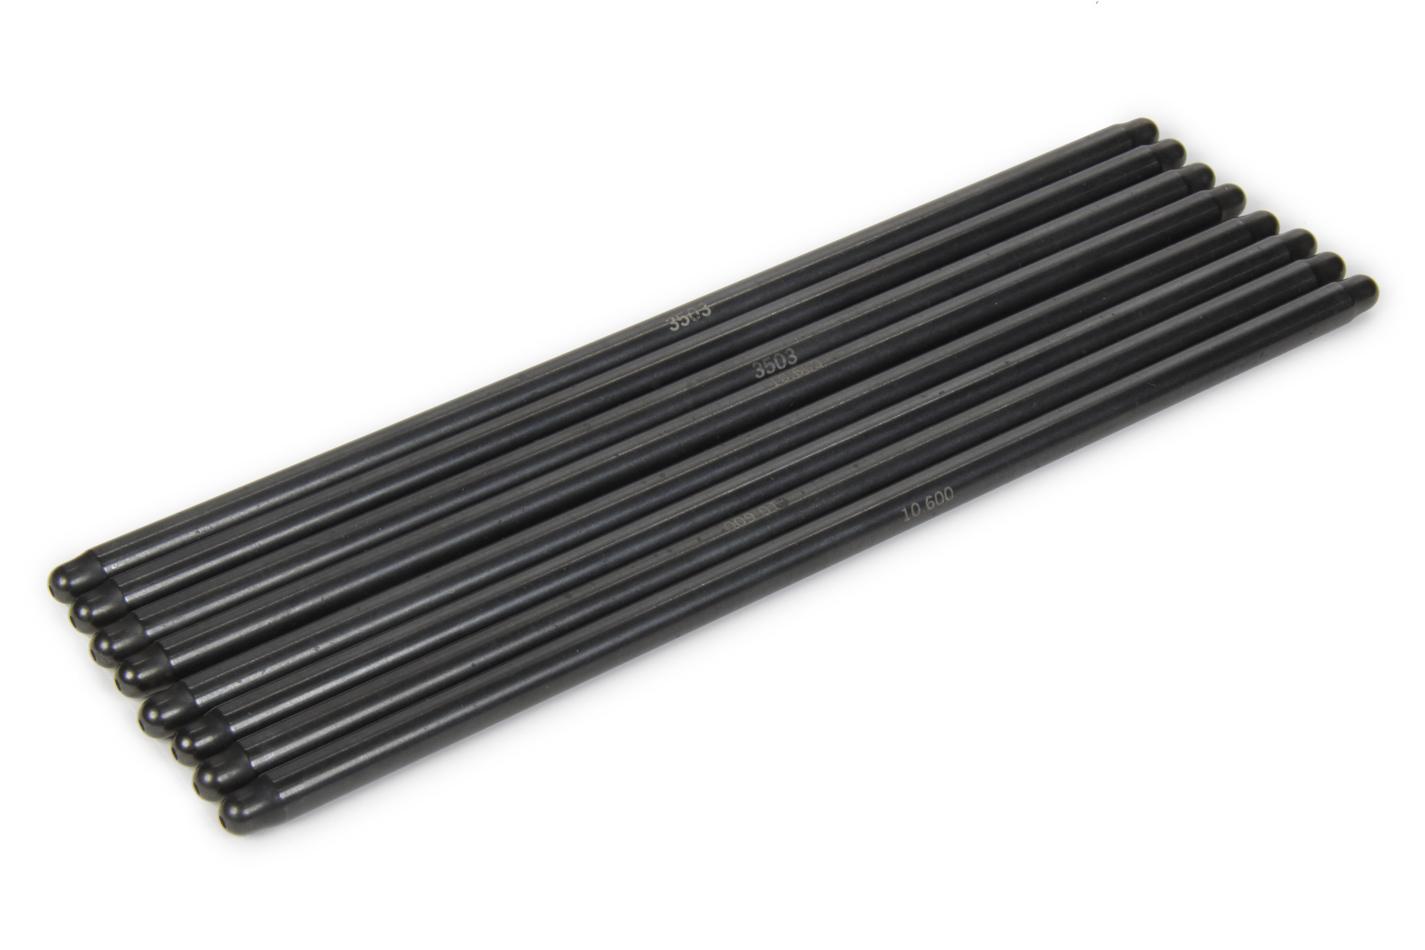 3/8in Moly Pushrods - 10.600in Long